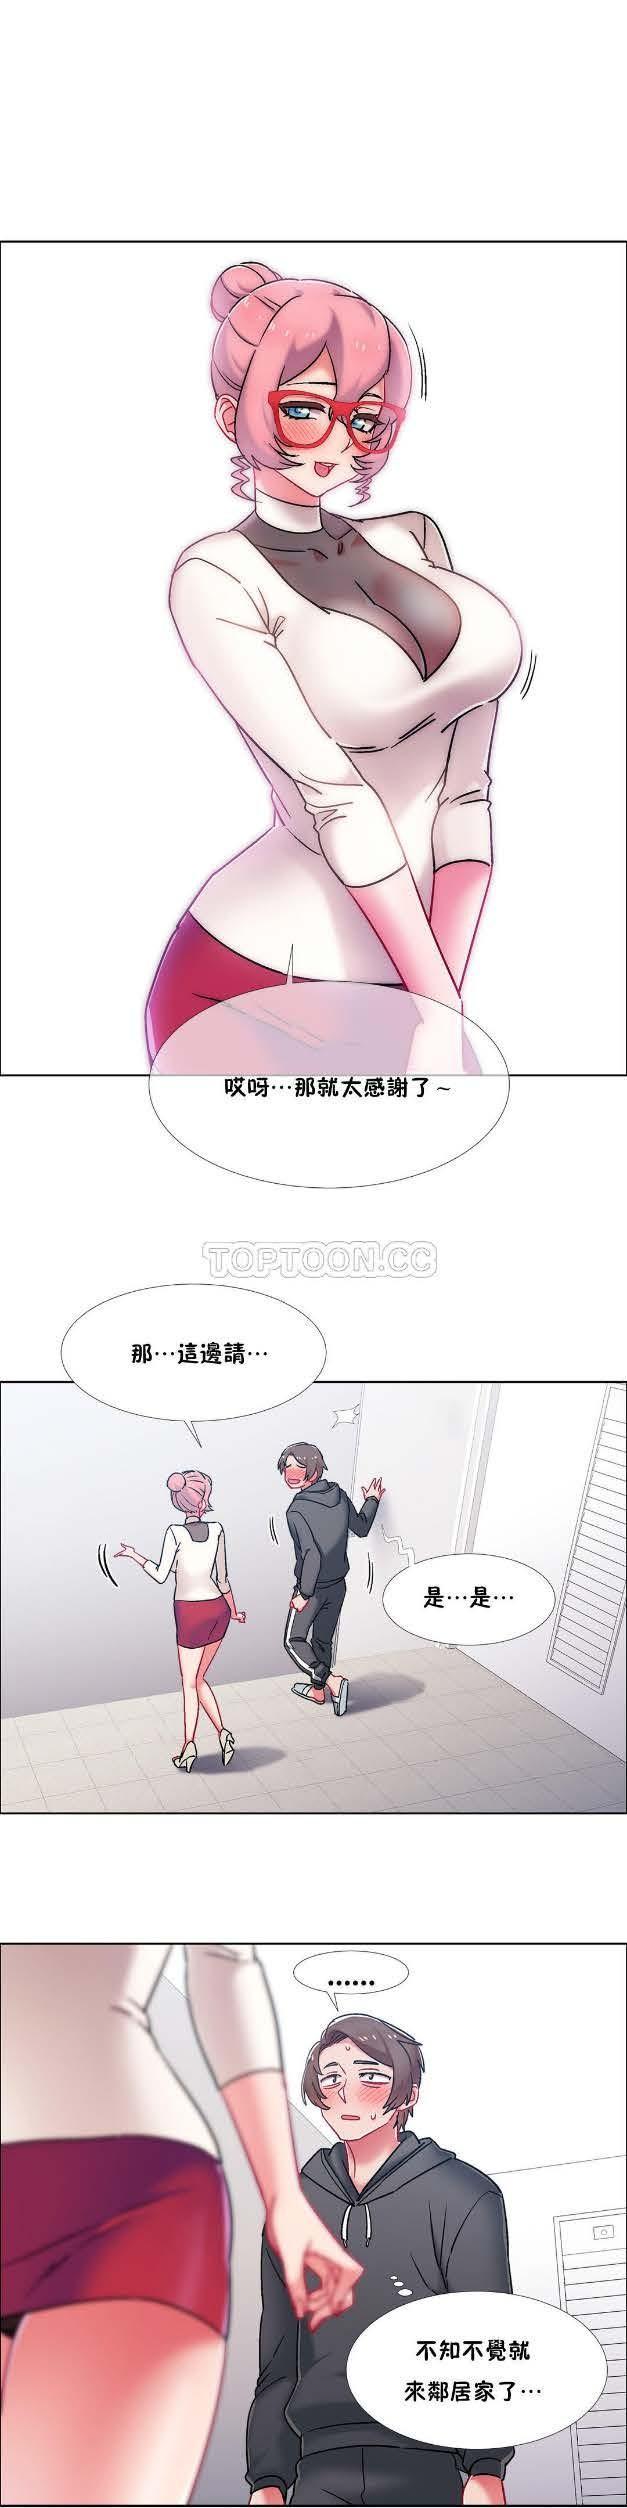 [Studio Wannabe] Rental Girls | 出租女郎 Ch. 33-58 [Chinese]  第二季 完结 293